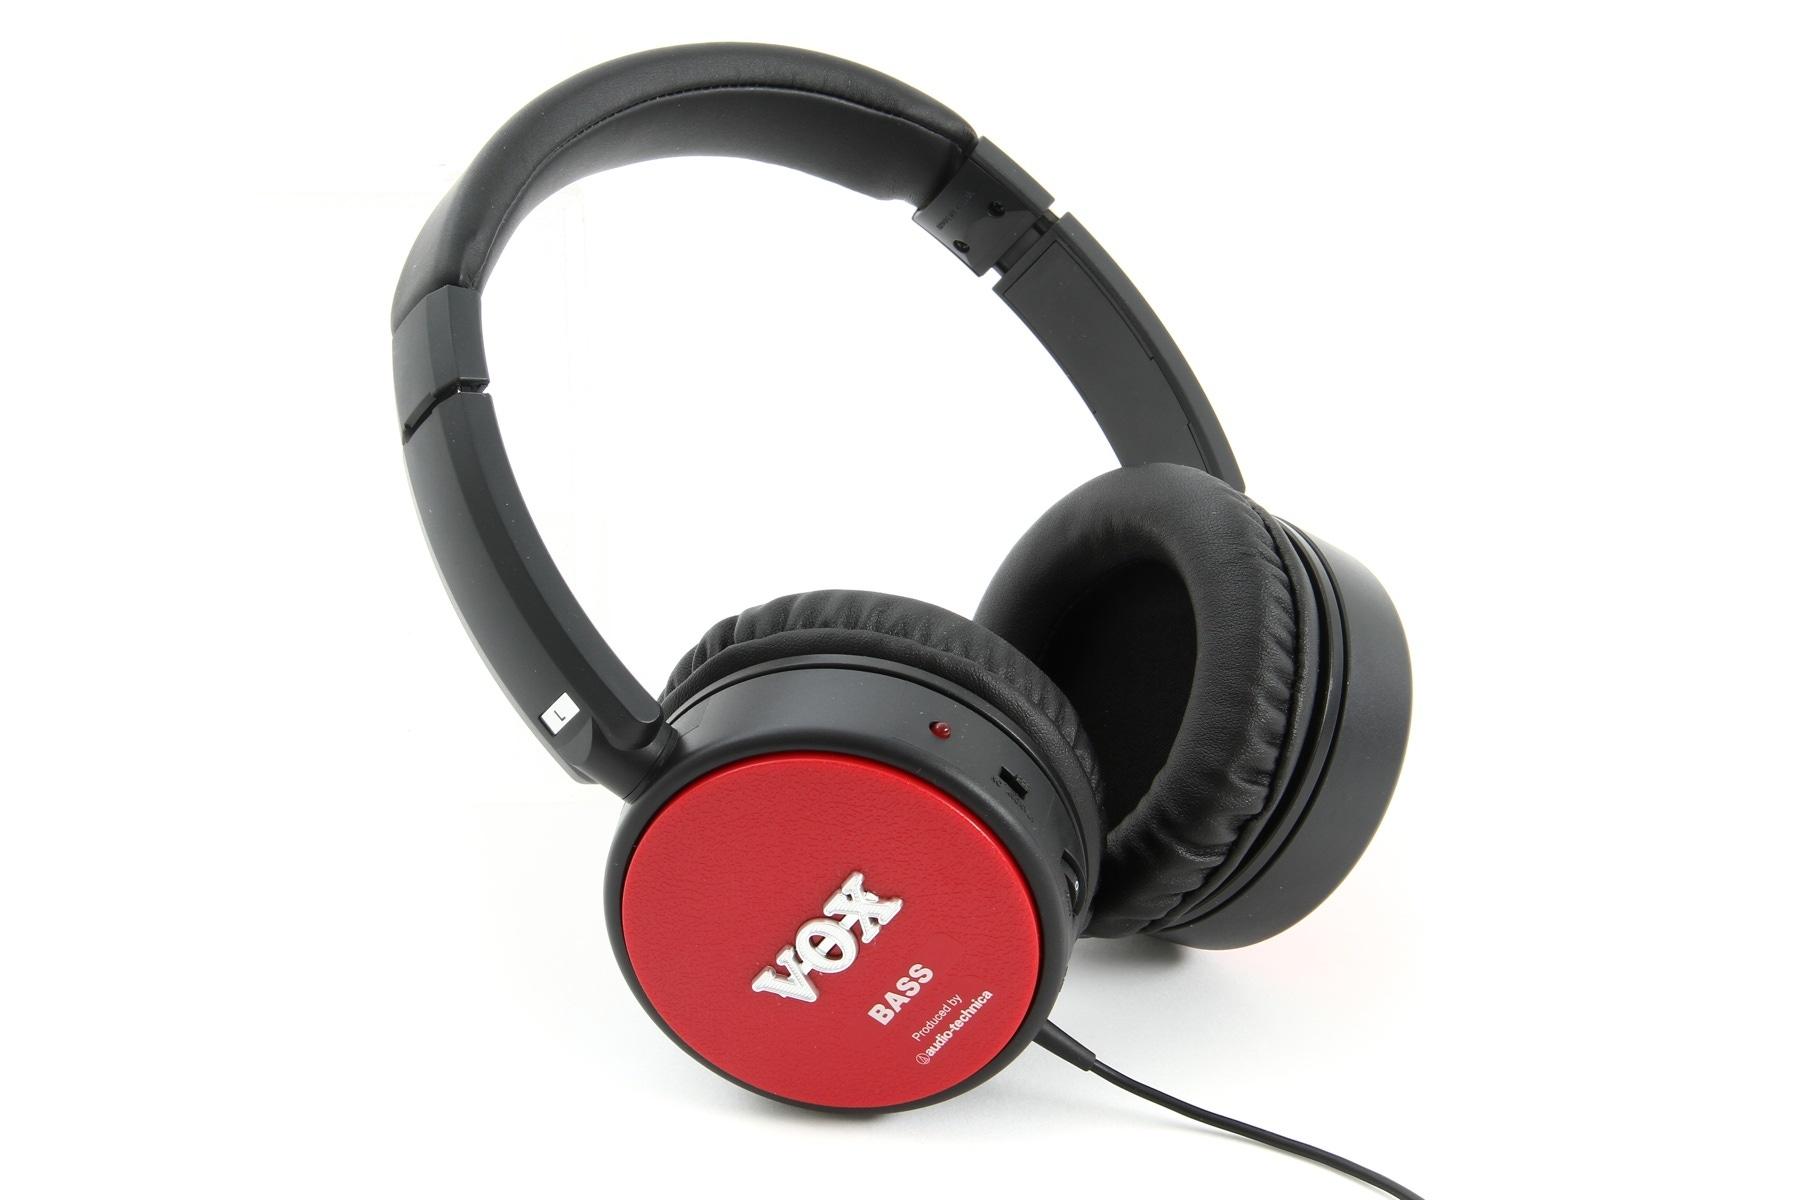 pitbull audio vox amphones active powered guitar headphones bass practice amplifier aphn bass. Black Bedroom Furniture Sets. Home Design Ideas